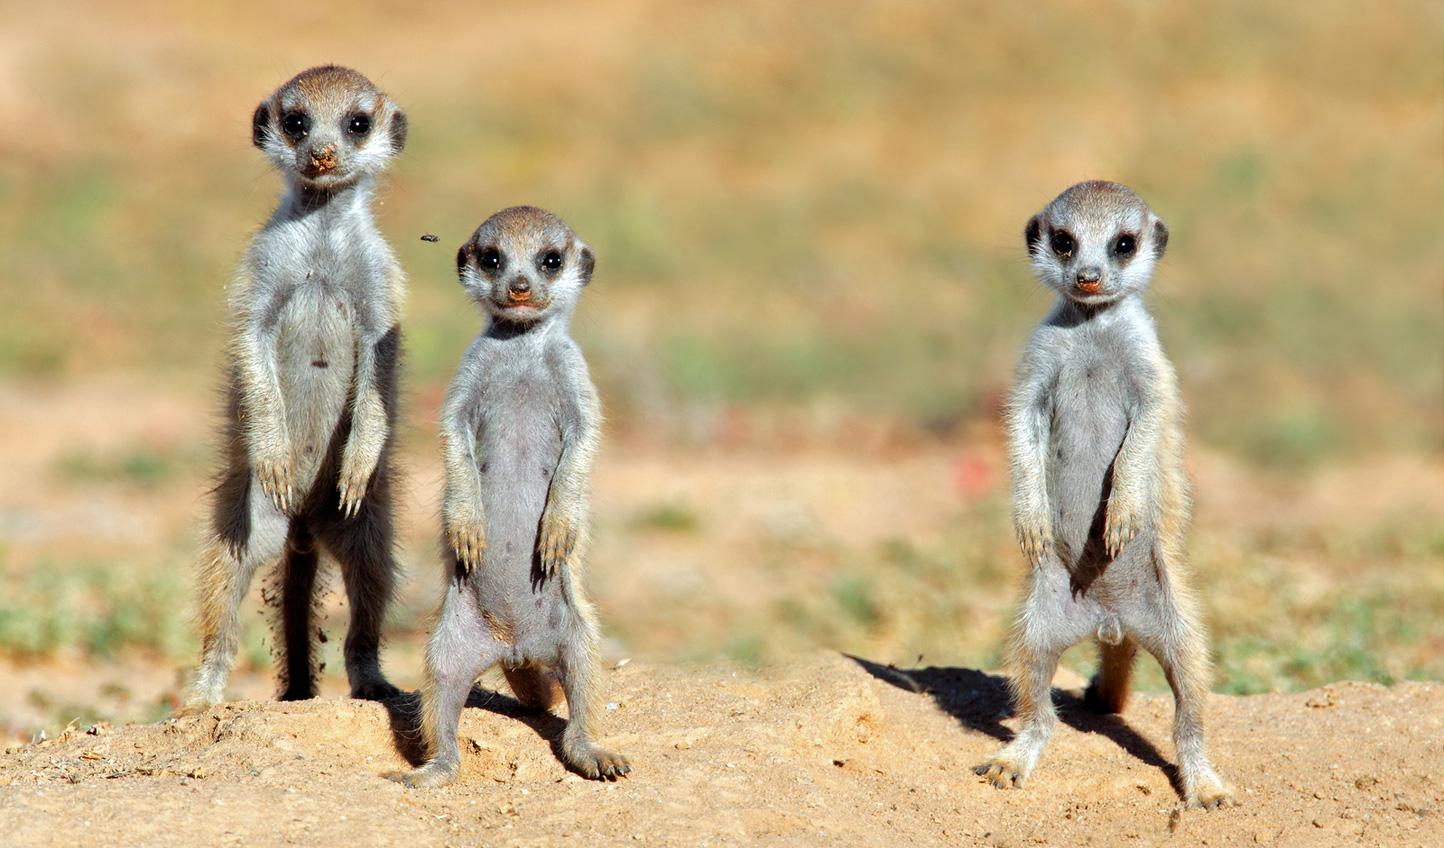 Meet the local meerkat colony